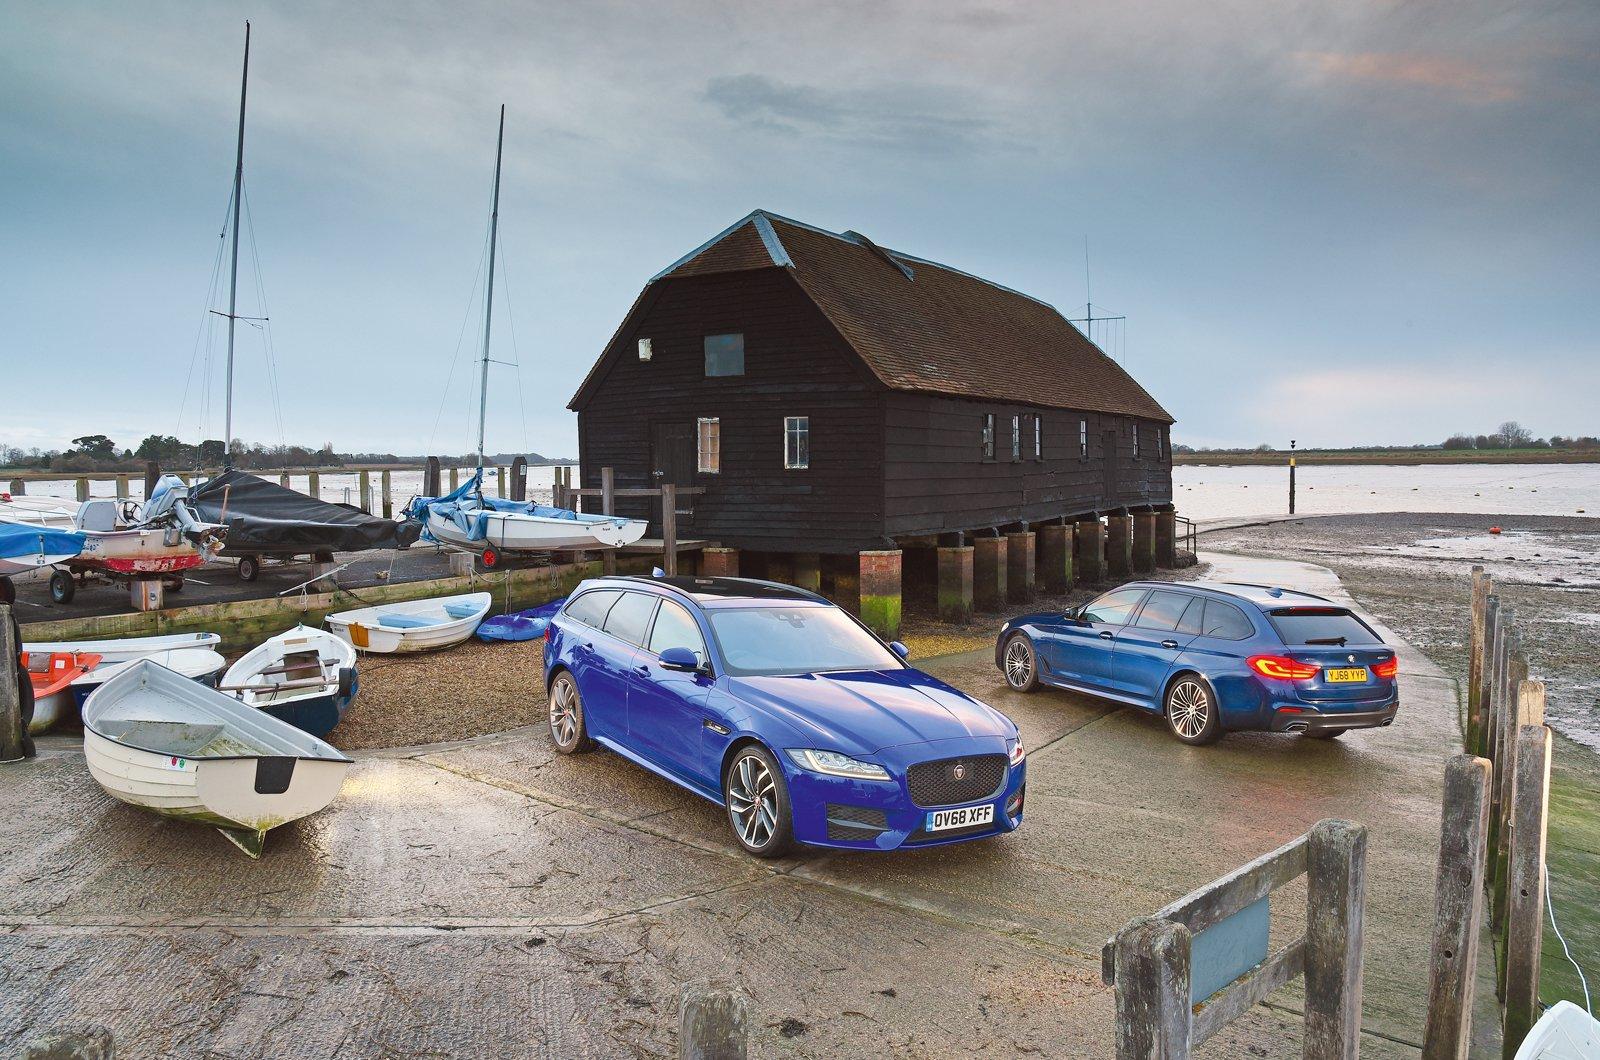 BMW 5 Series Touring vs Jaguar XF Sportbrake